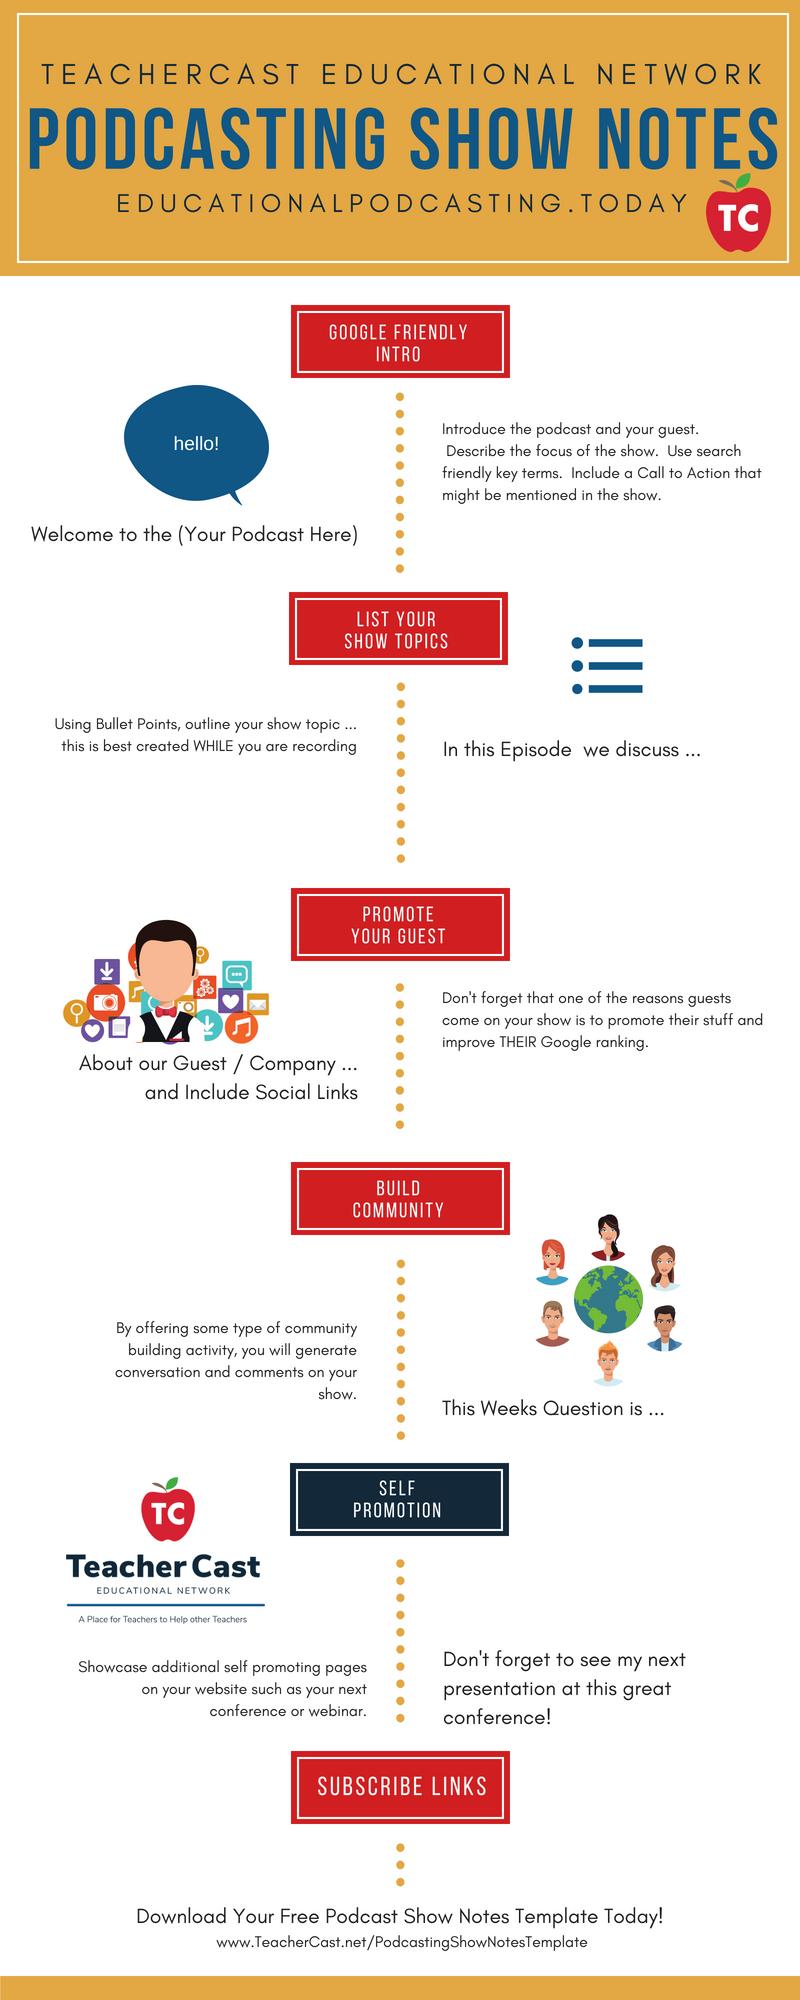 TeacherCast Show Notes Template Infographic